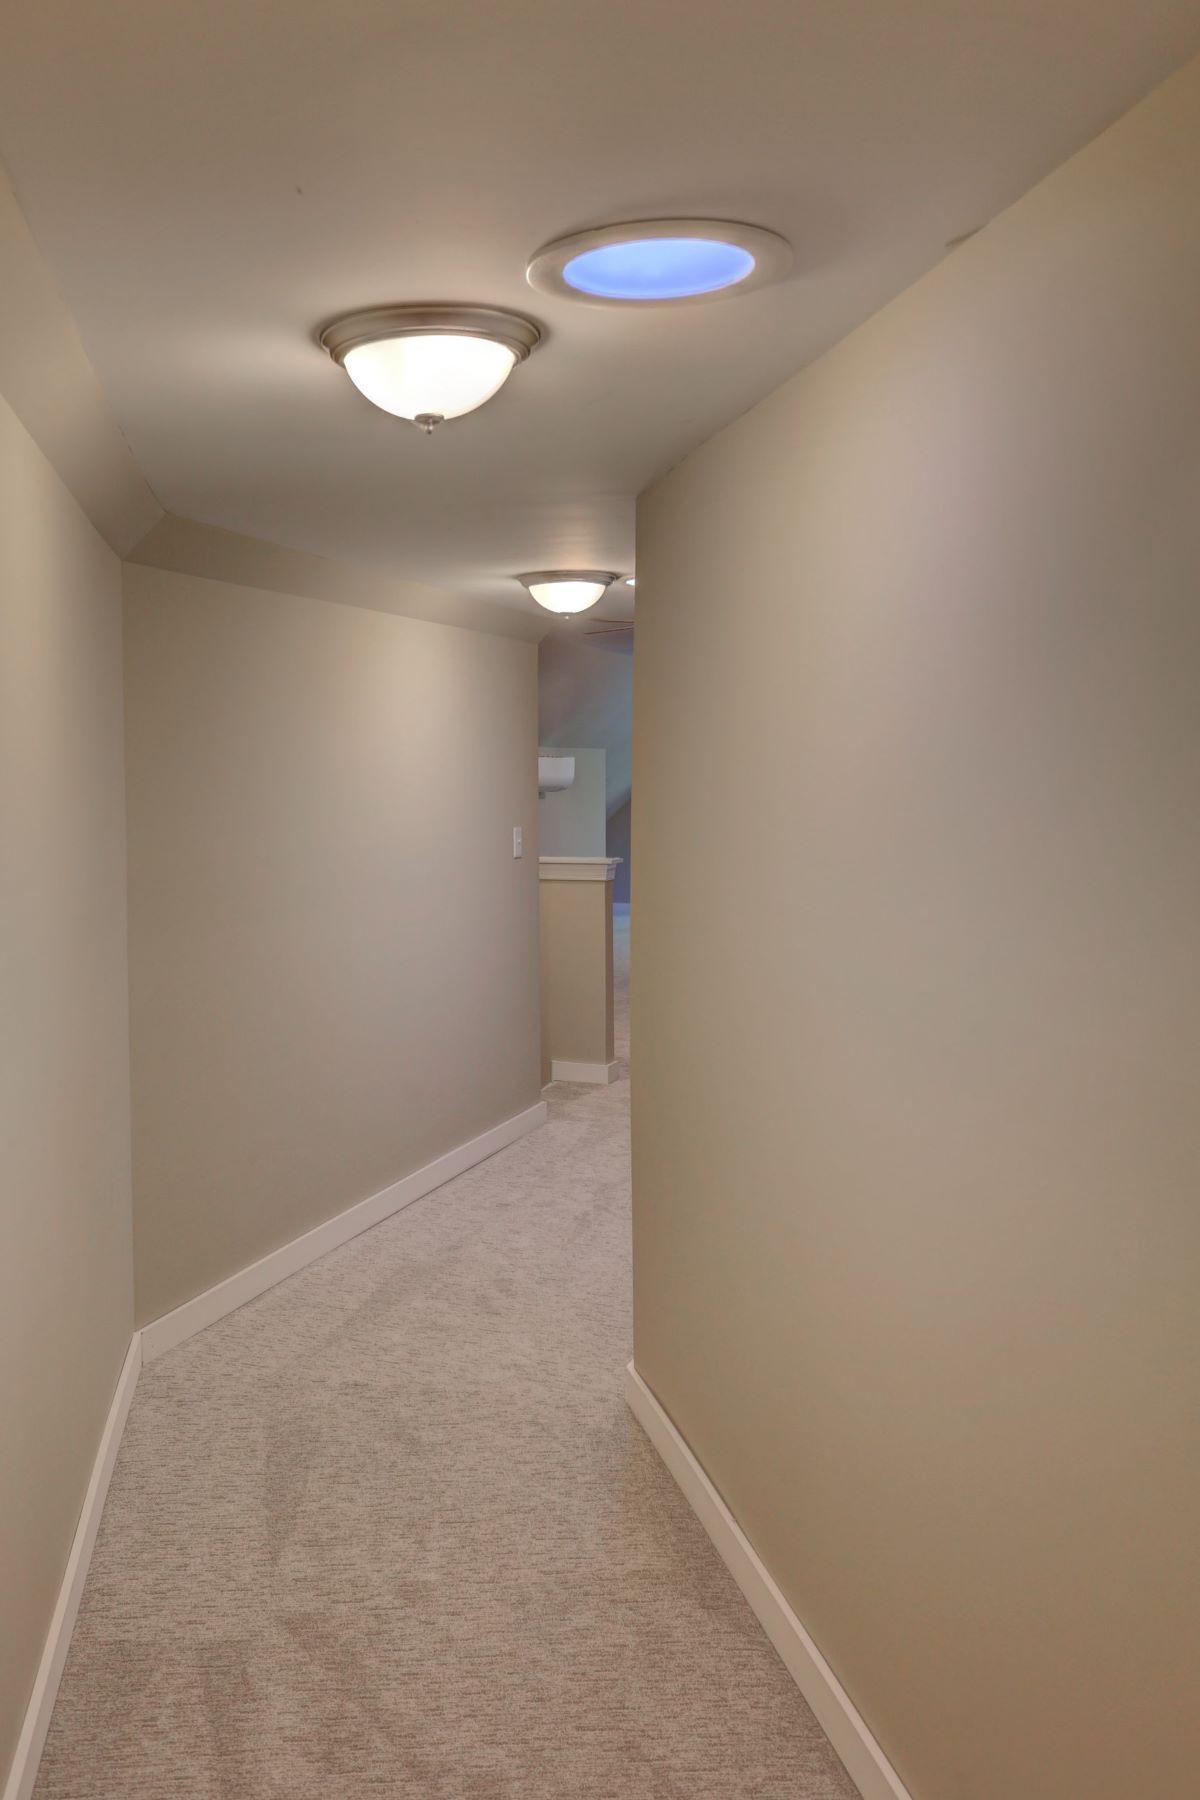 Additional photo for property listing at 5 Joann Lane 5 Joann Lane Pequea, 宾夕法尼亚州 17565 美国